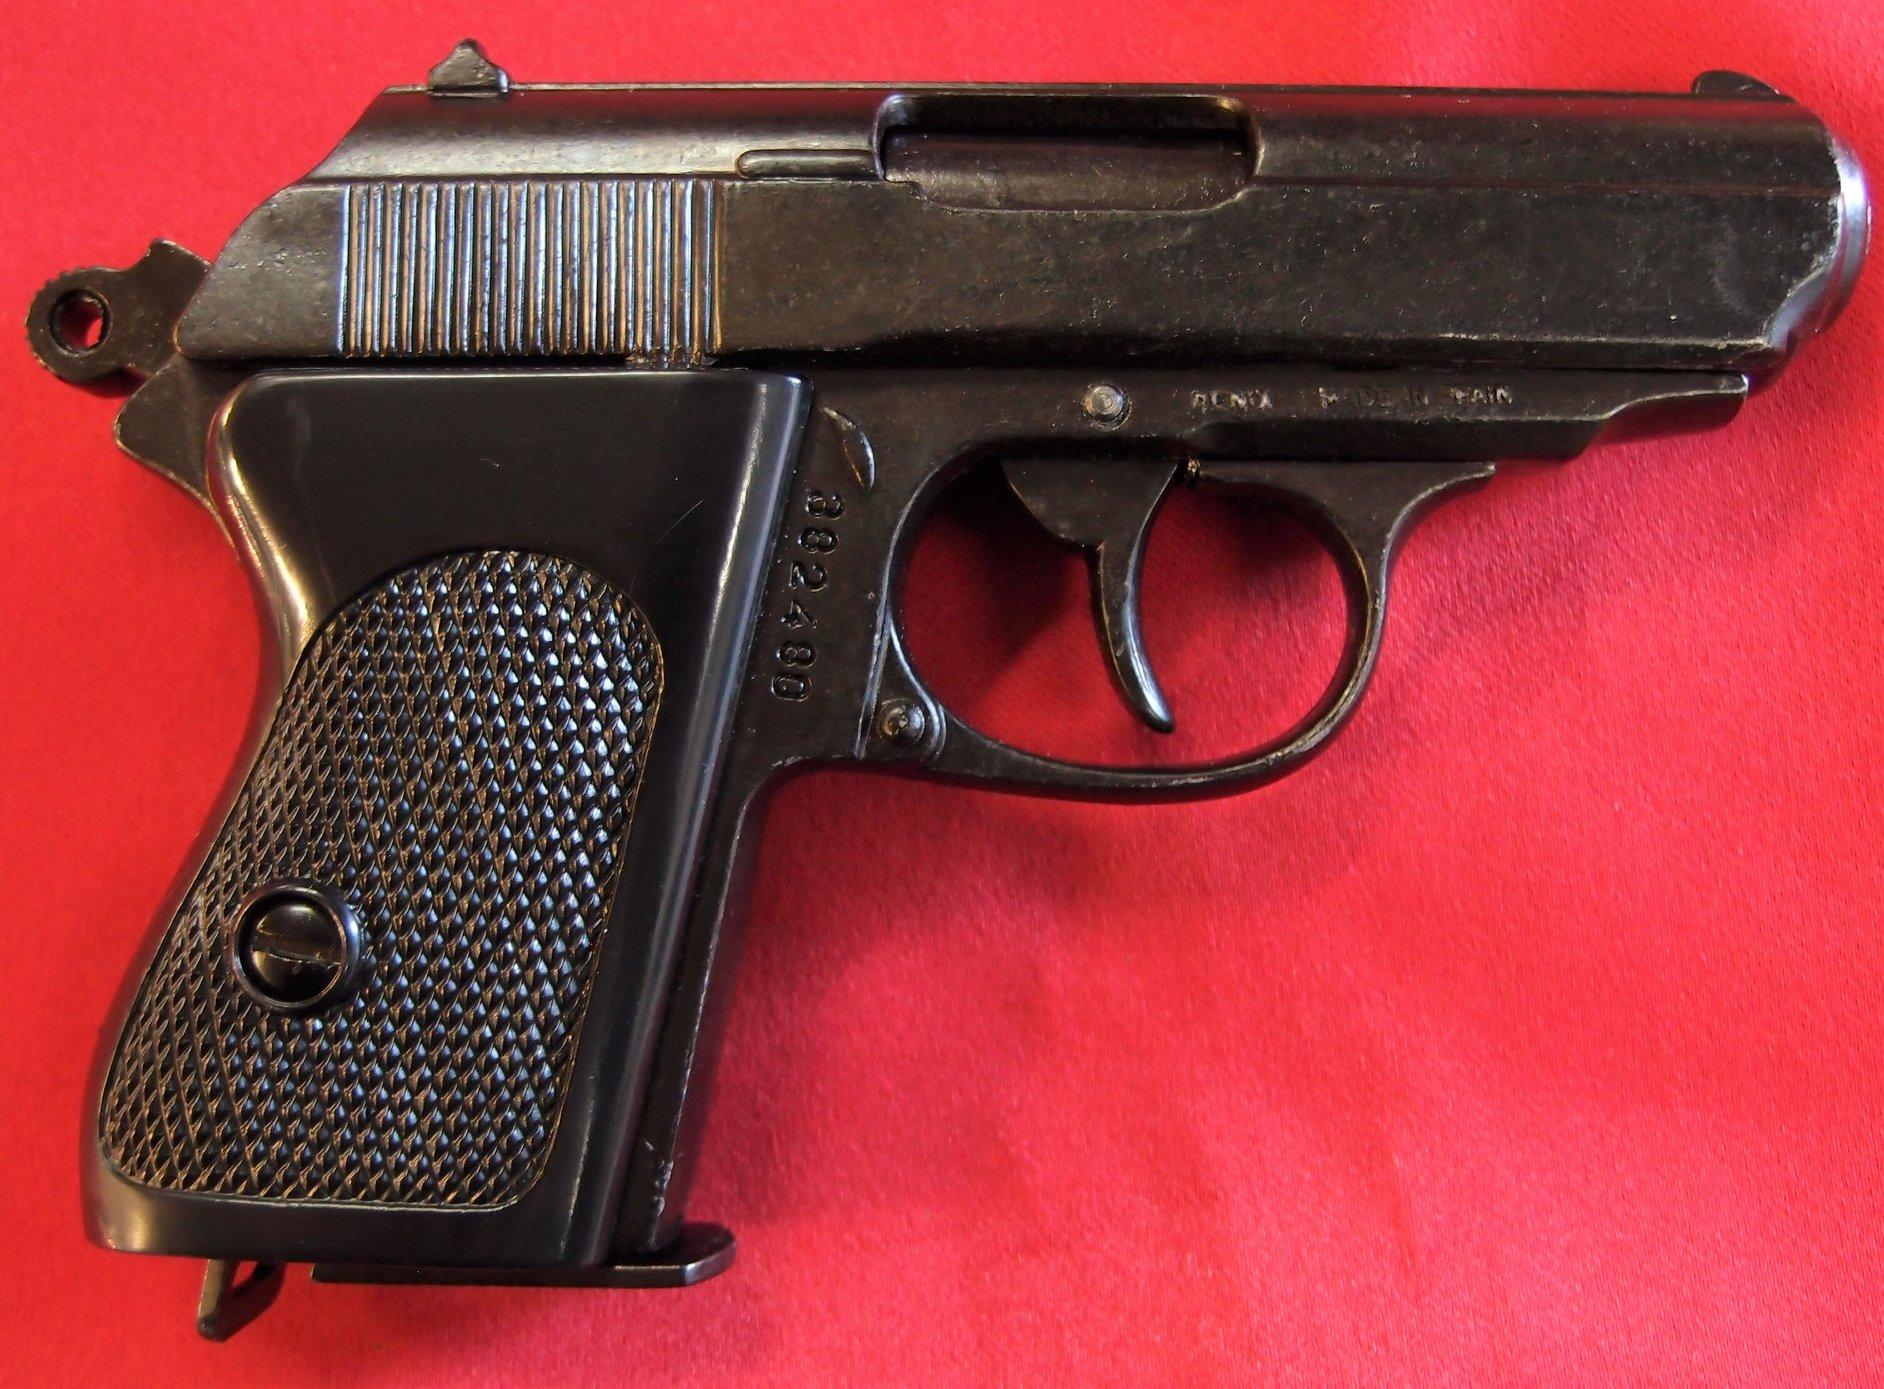 denix replica gun walther ppk james bond style pistol jb military